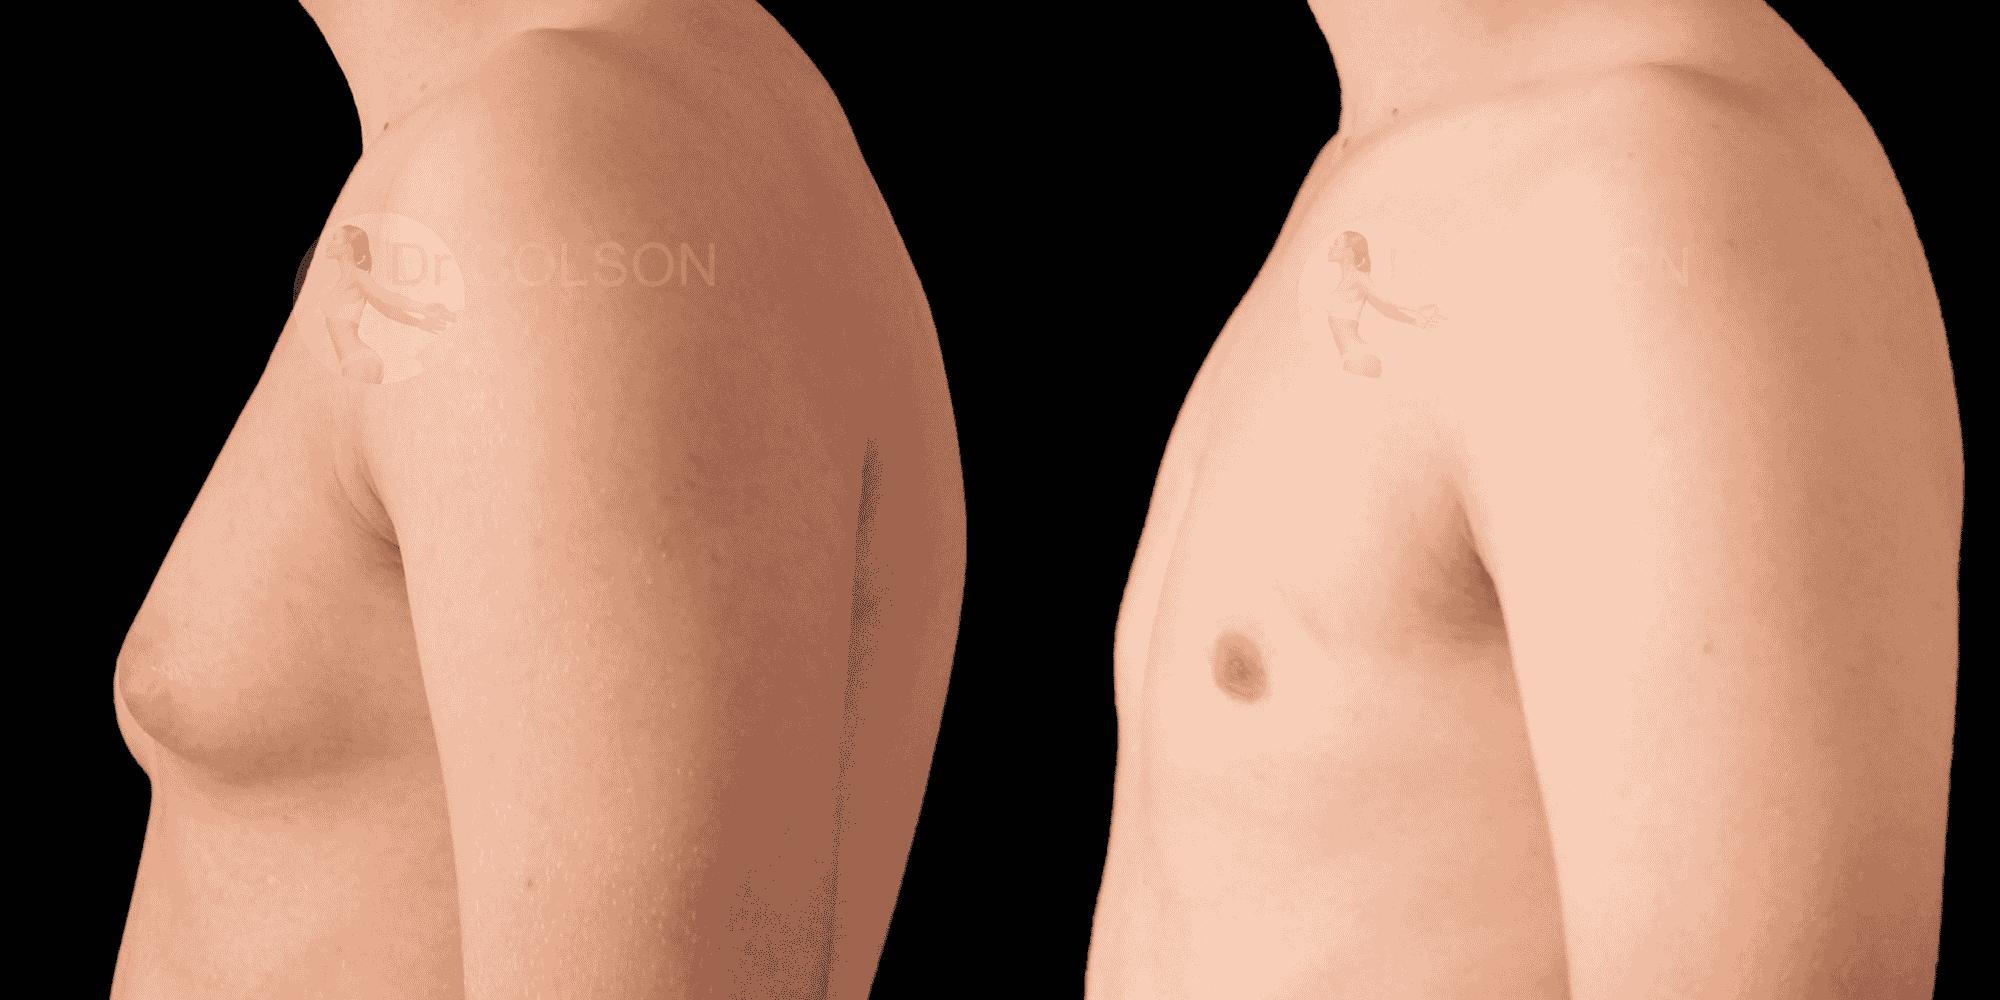 Dr Colson - Chirurgie homme - Gynecomastie Profil